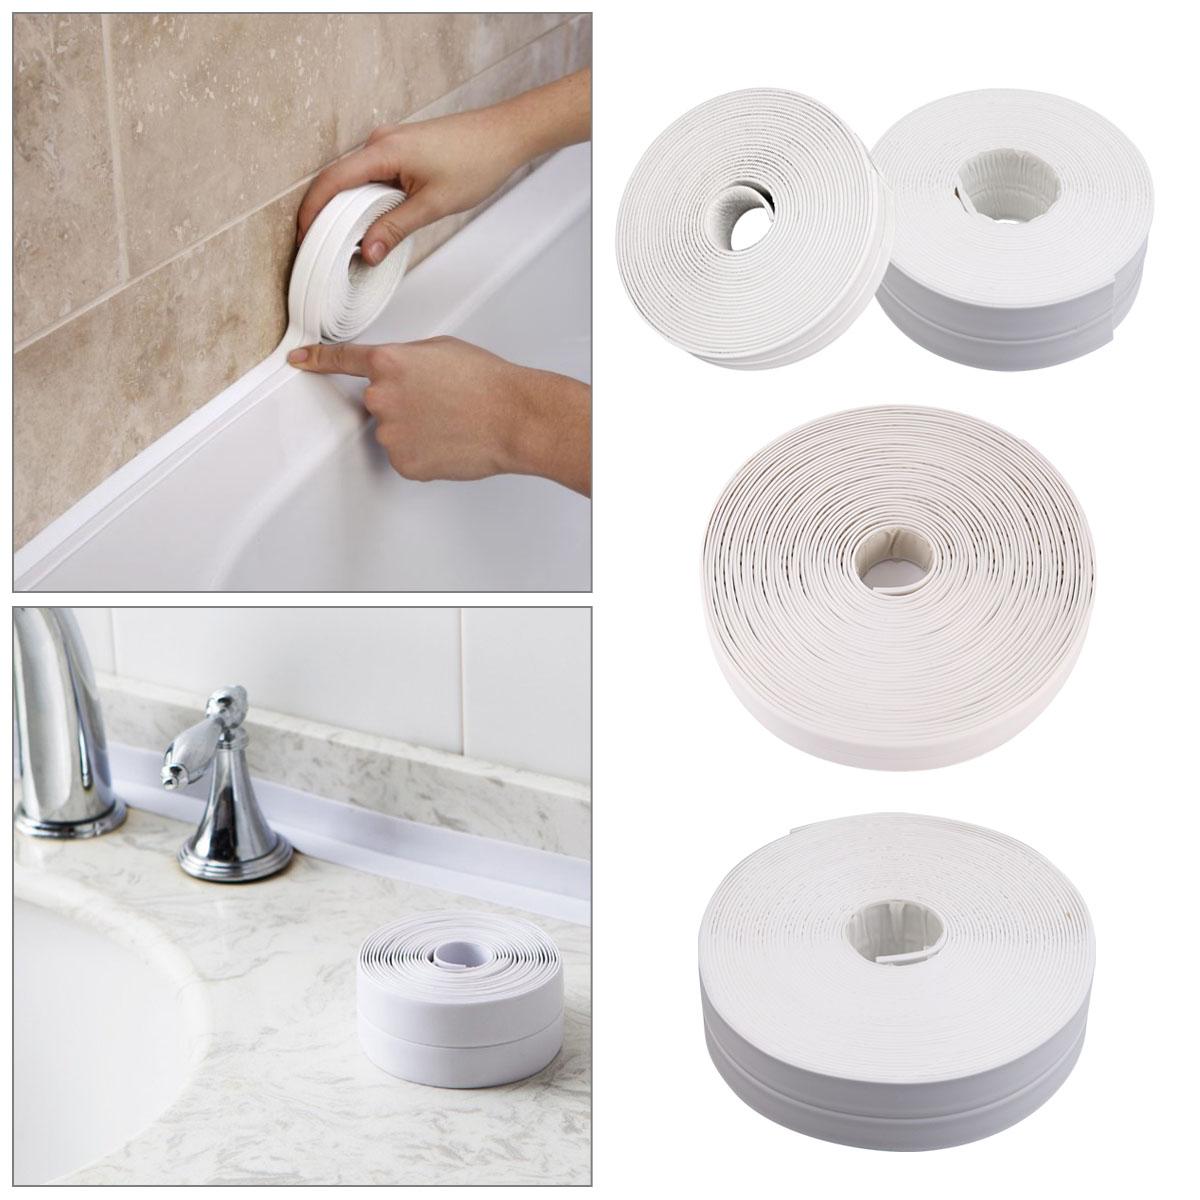 self adhesive kitchen sink bath basin